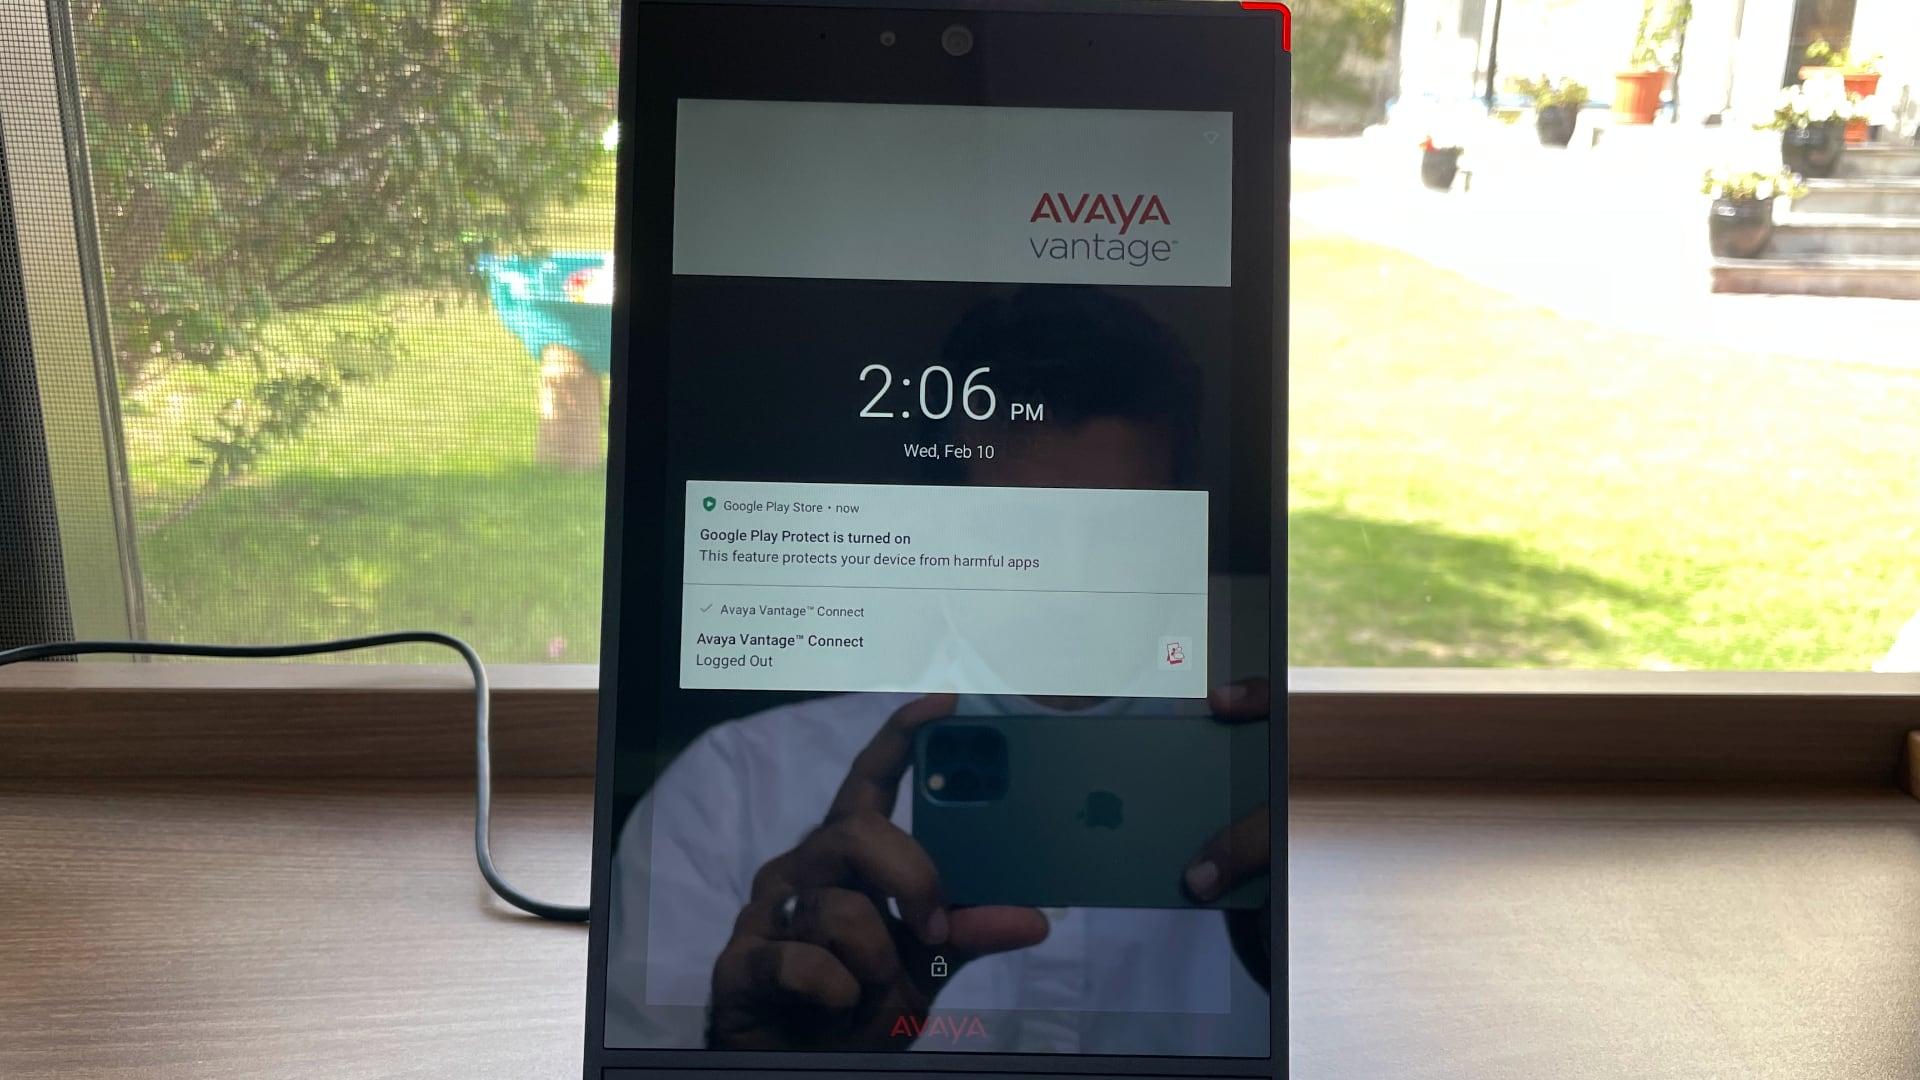 Avaya Vantage K175